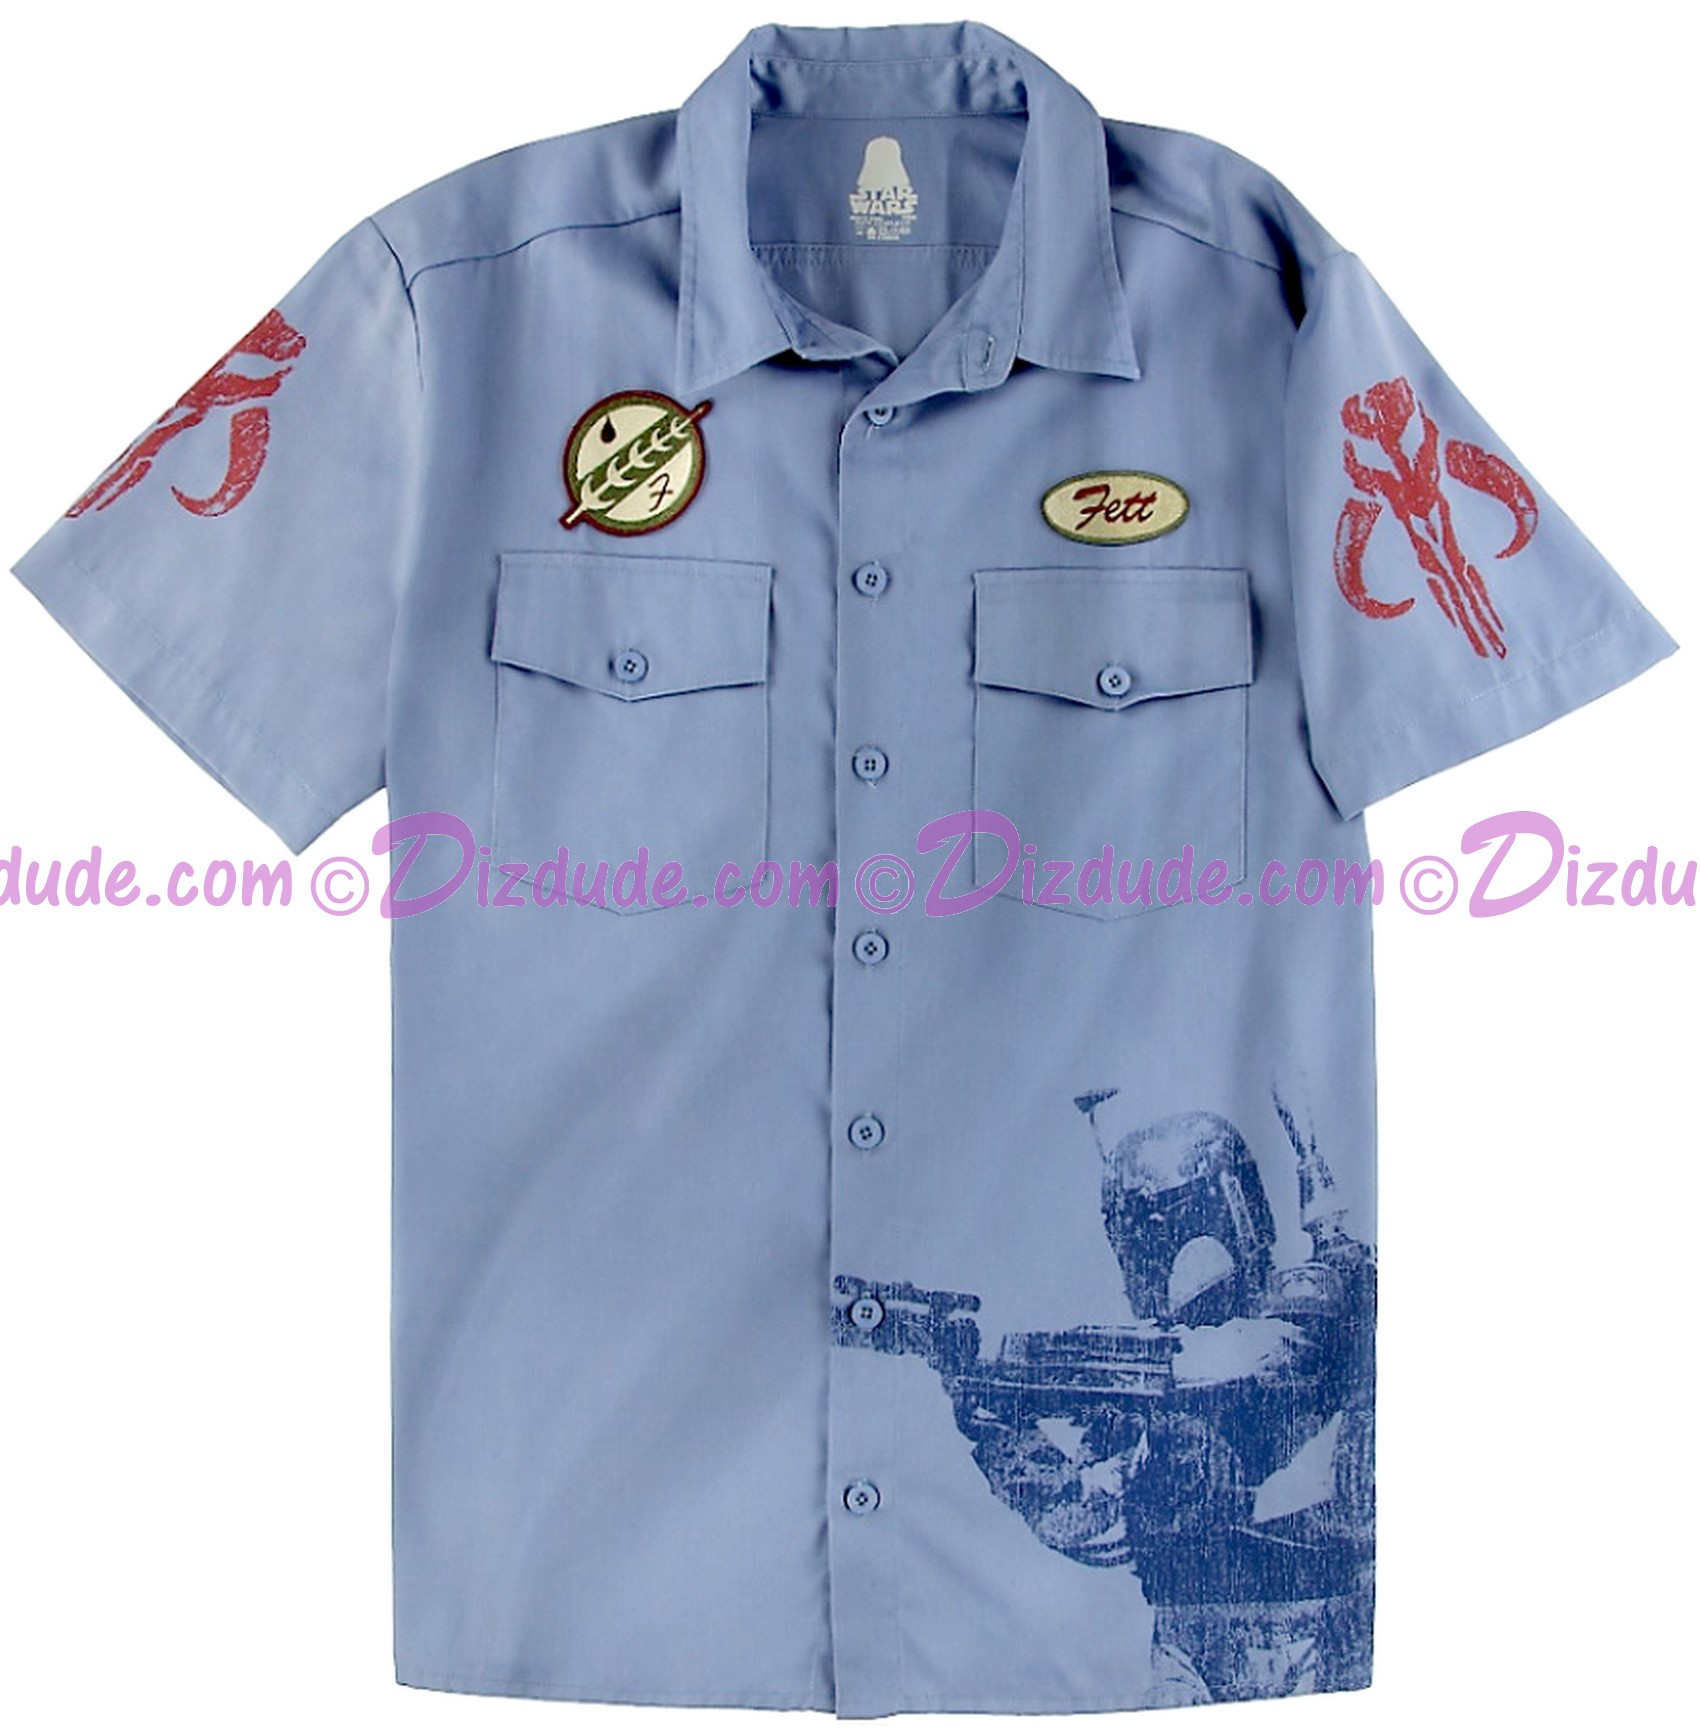 Disney Star Wars Jango or Boba Fett Blue Collar Work Adult Shirt © Dizdude.com